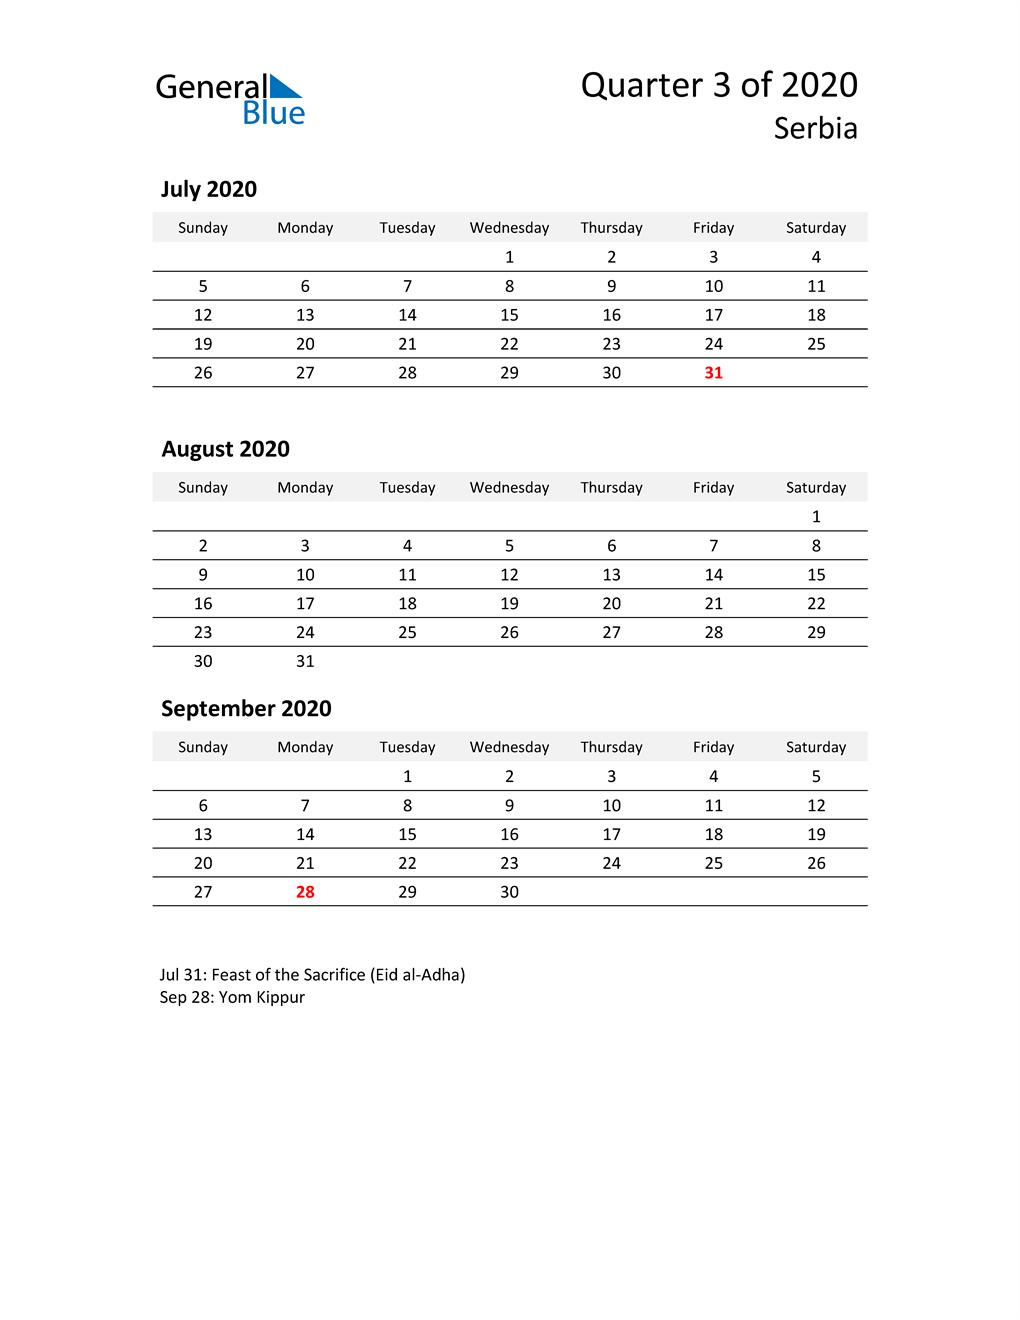 2020 Three-Month Calendar for Serbia